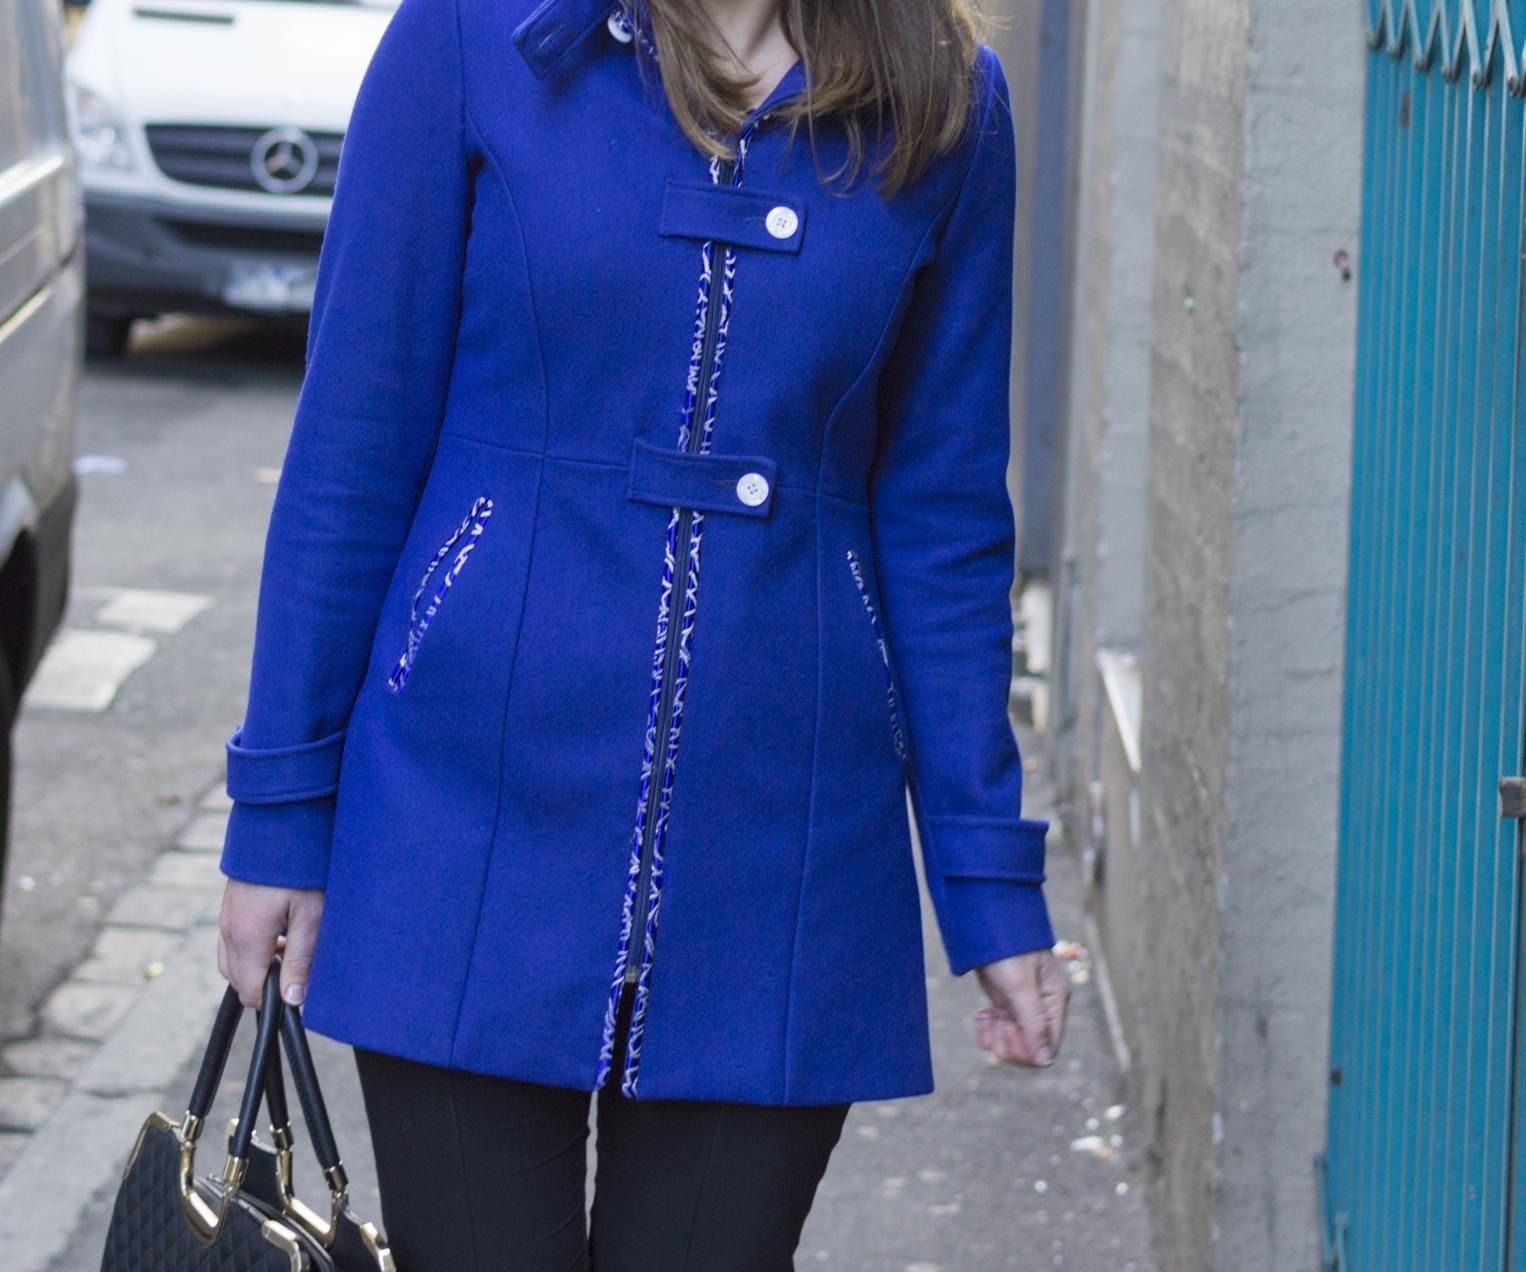 blue-winter-coat